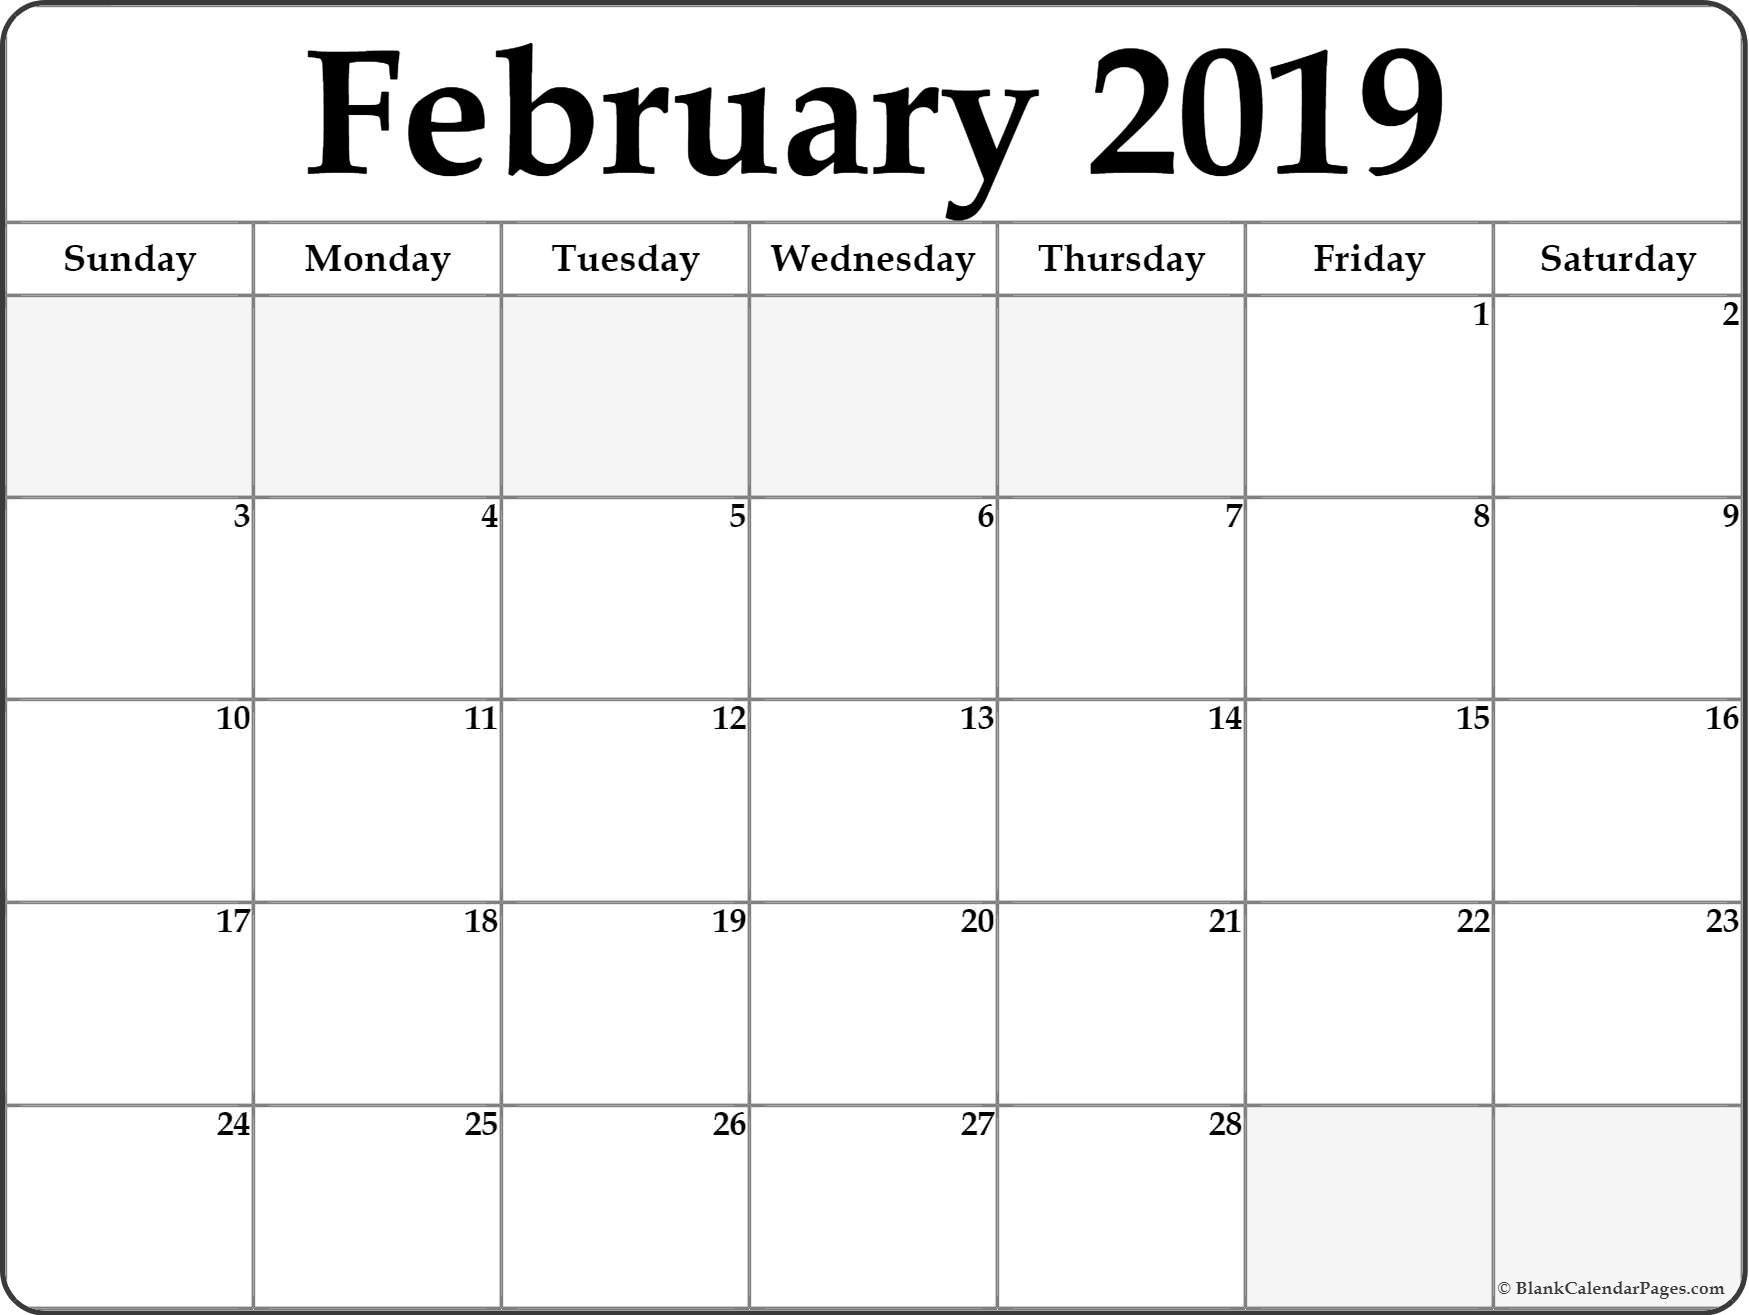 Free Printable Calendar That I Can Edit | Ten Free Calanda Templete That I Can Edit